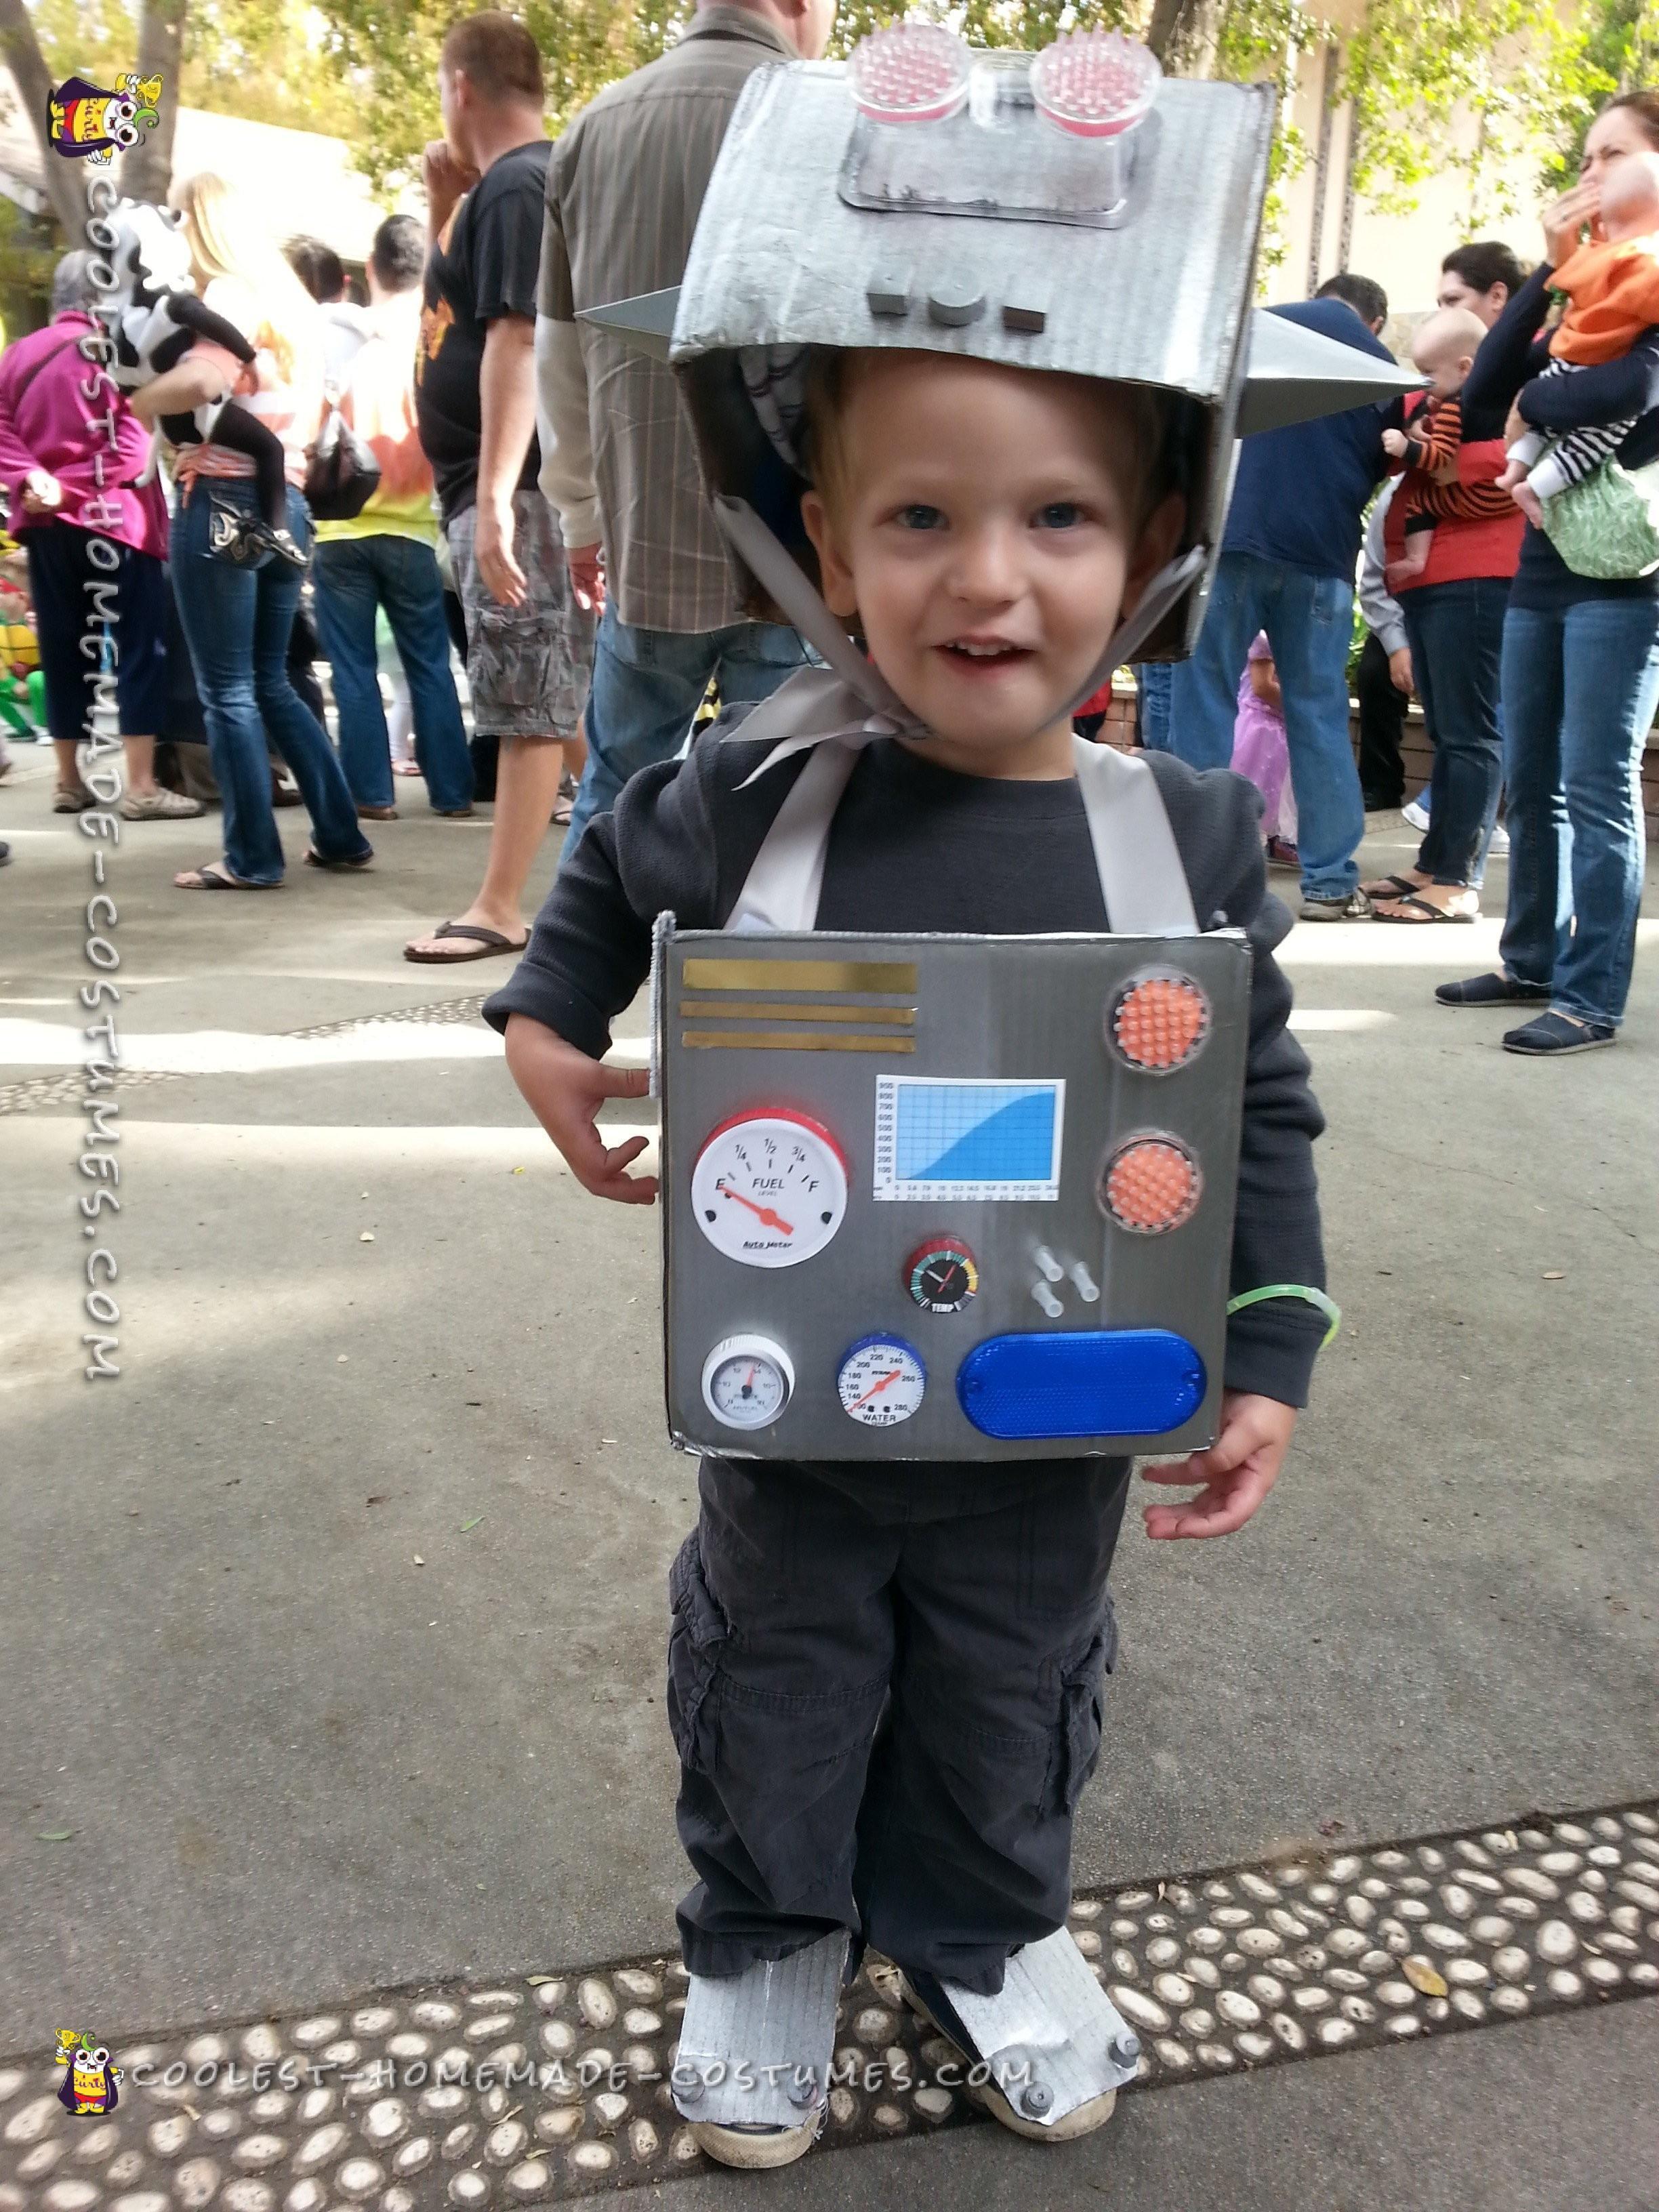 L-Bot (Robot) Costume for Toddler Boy